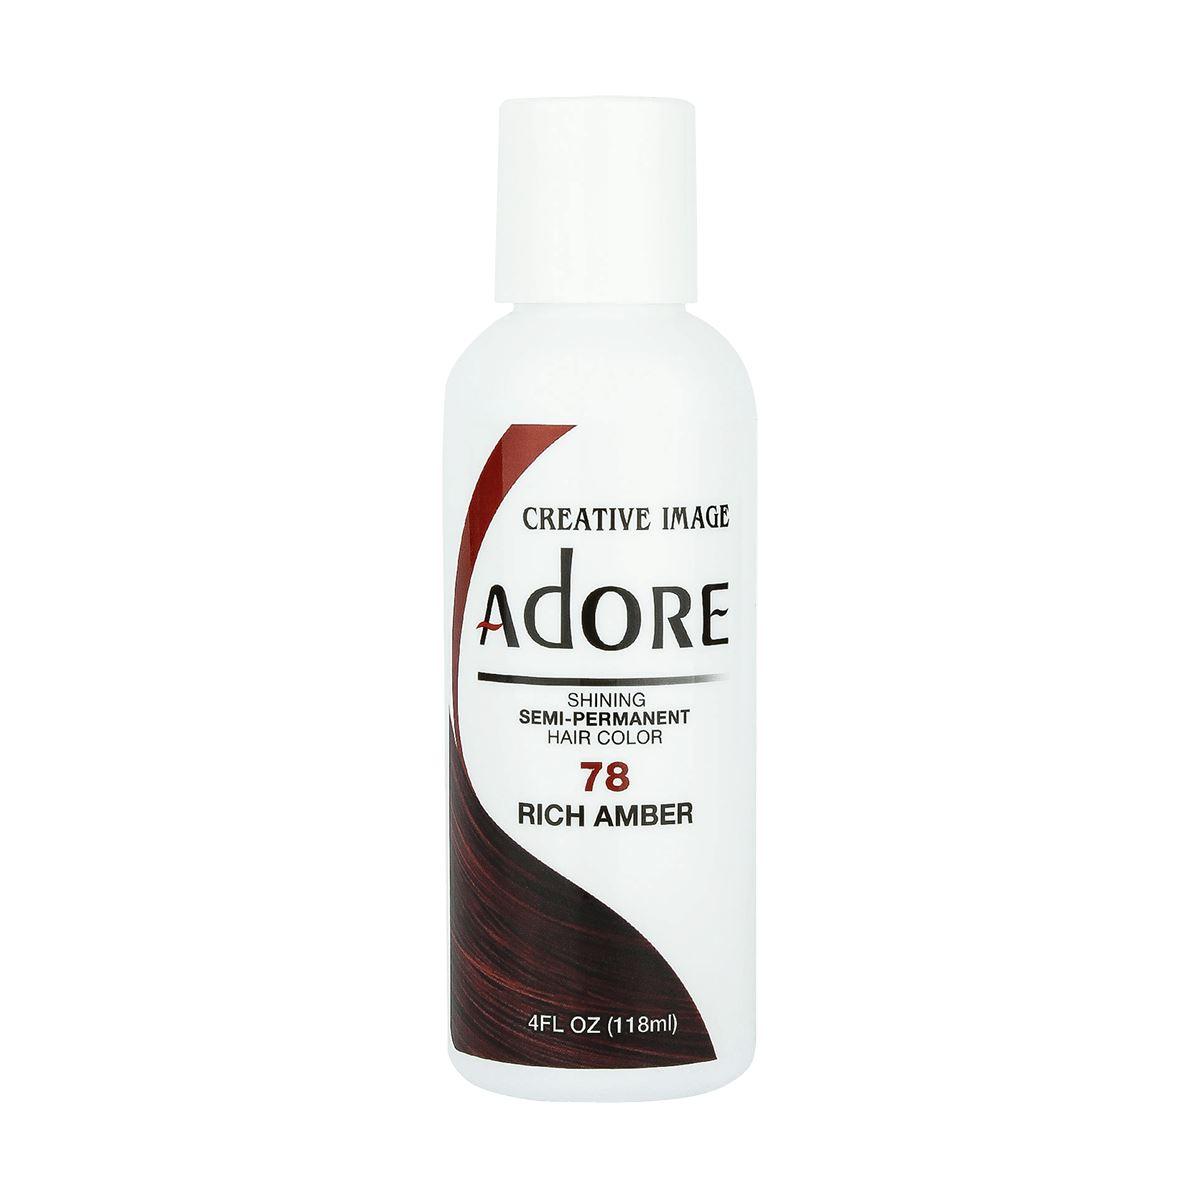 Creative Image Adore Shining Semi Permanent Hair Color 78 Rich Amber